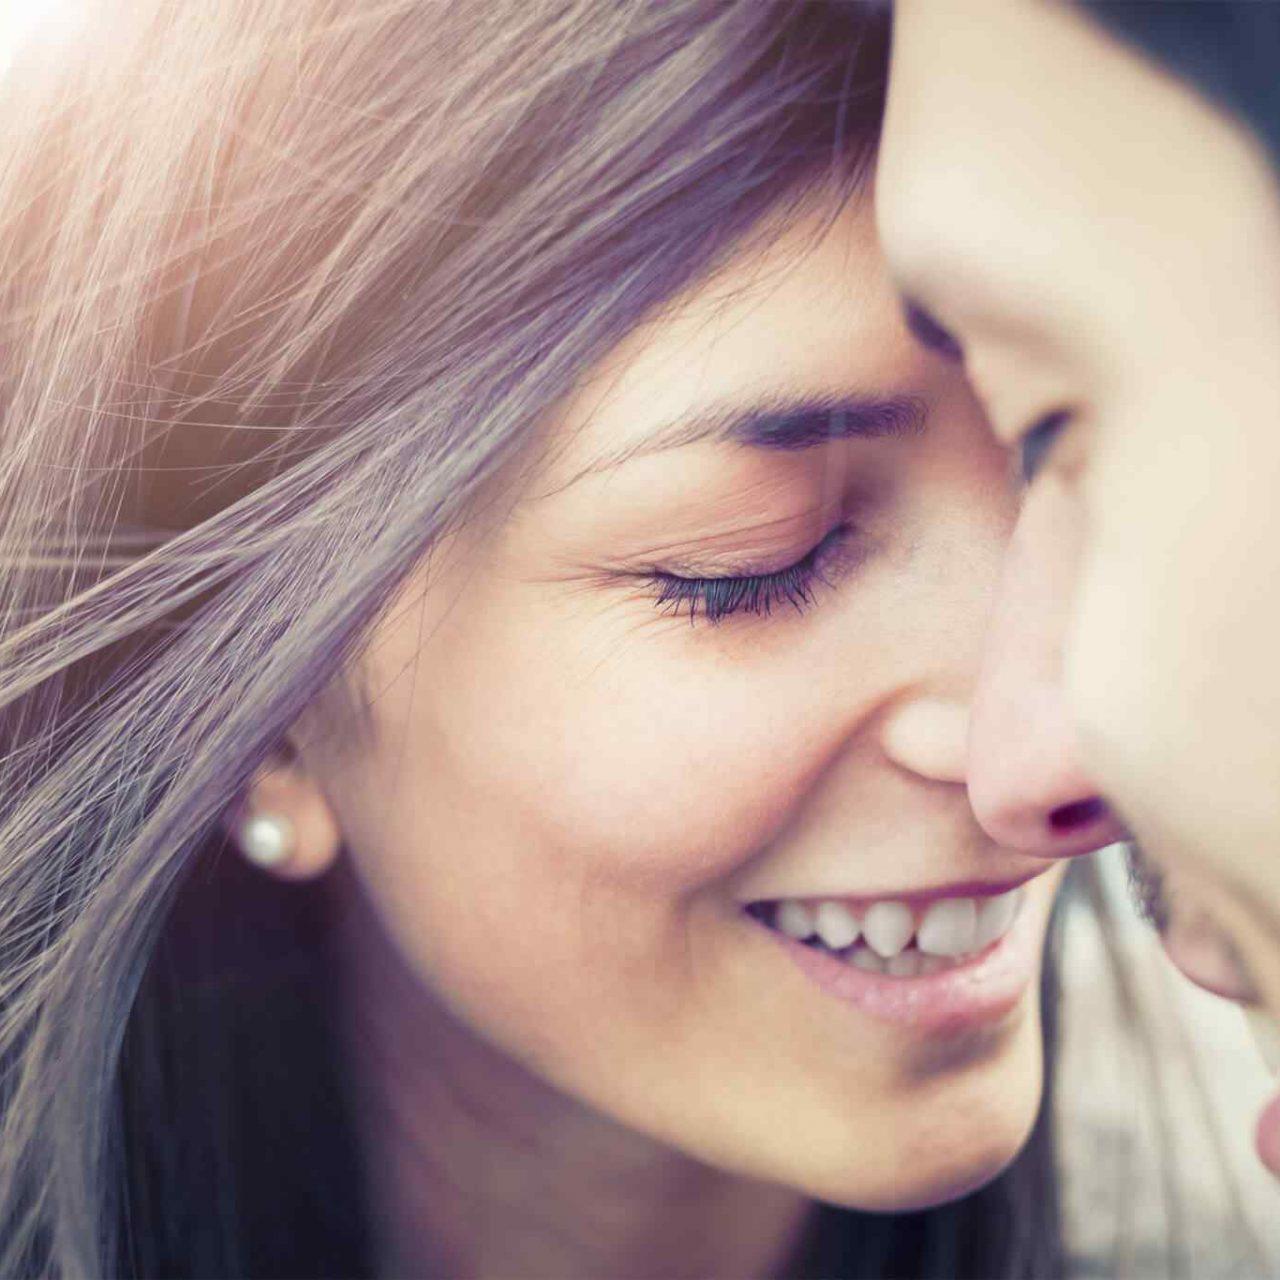 https://growthadvisors.pl/wp-content/uploads/2018/01/img-class-marriage-01-1280x1280.jpg